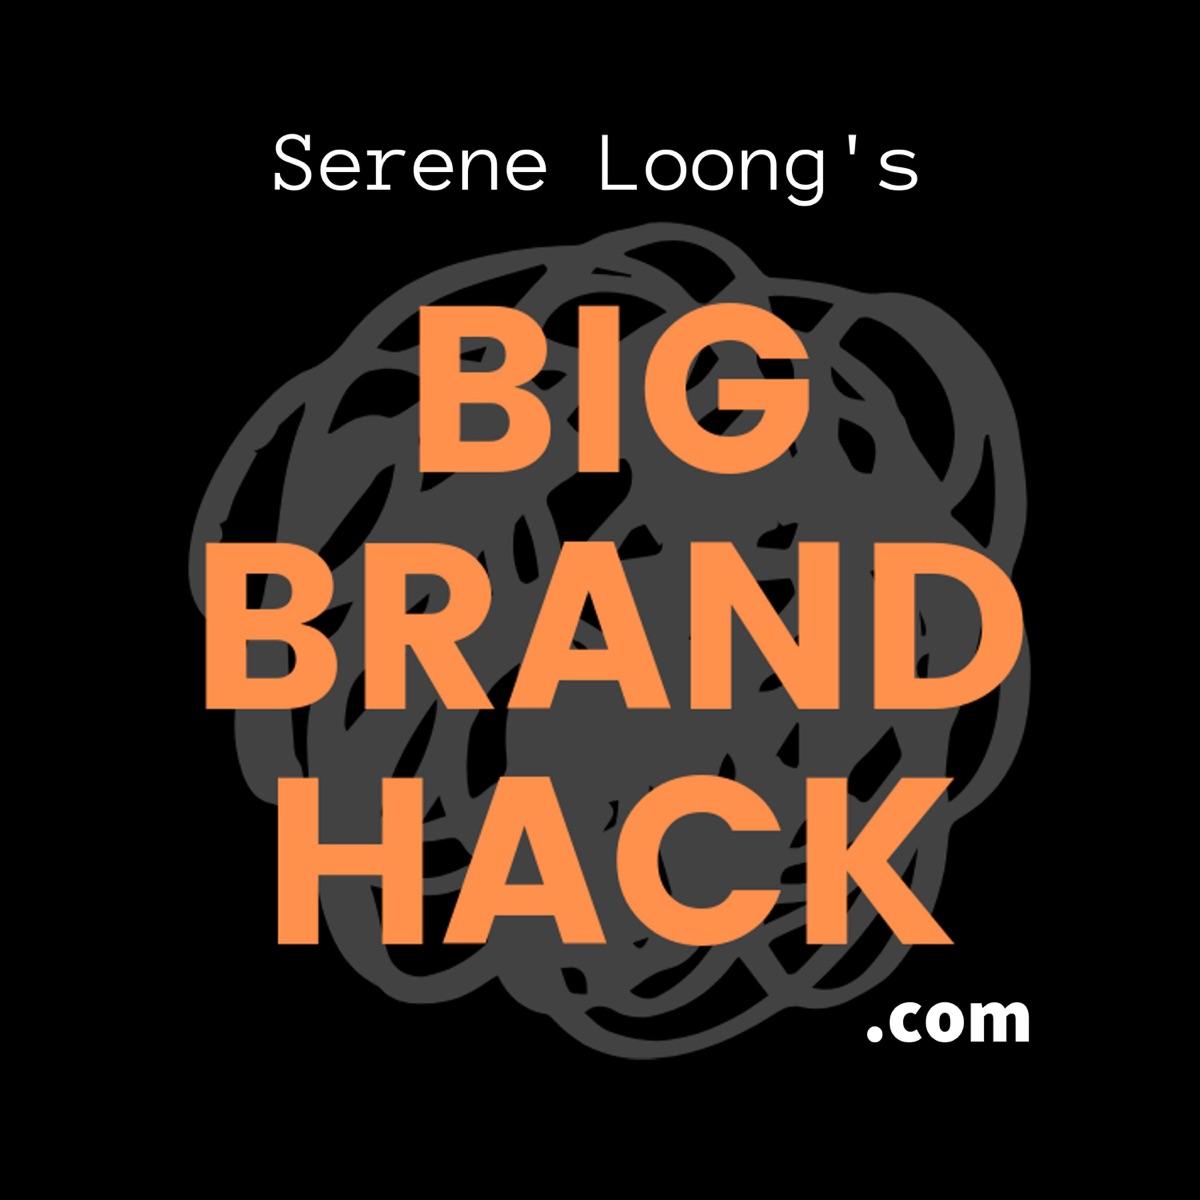 Big Brand Hack